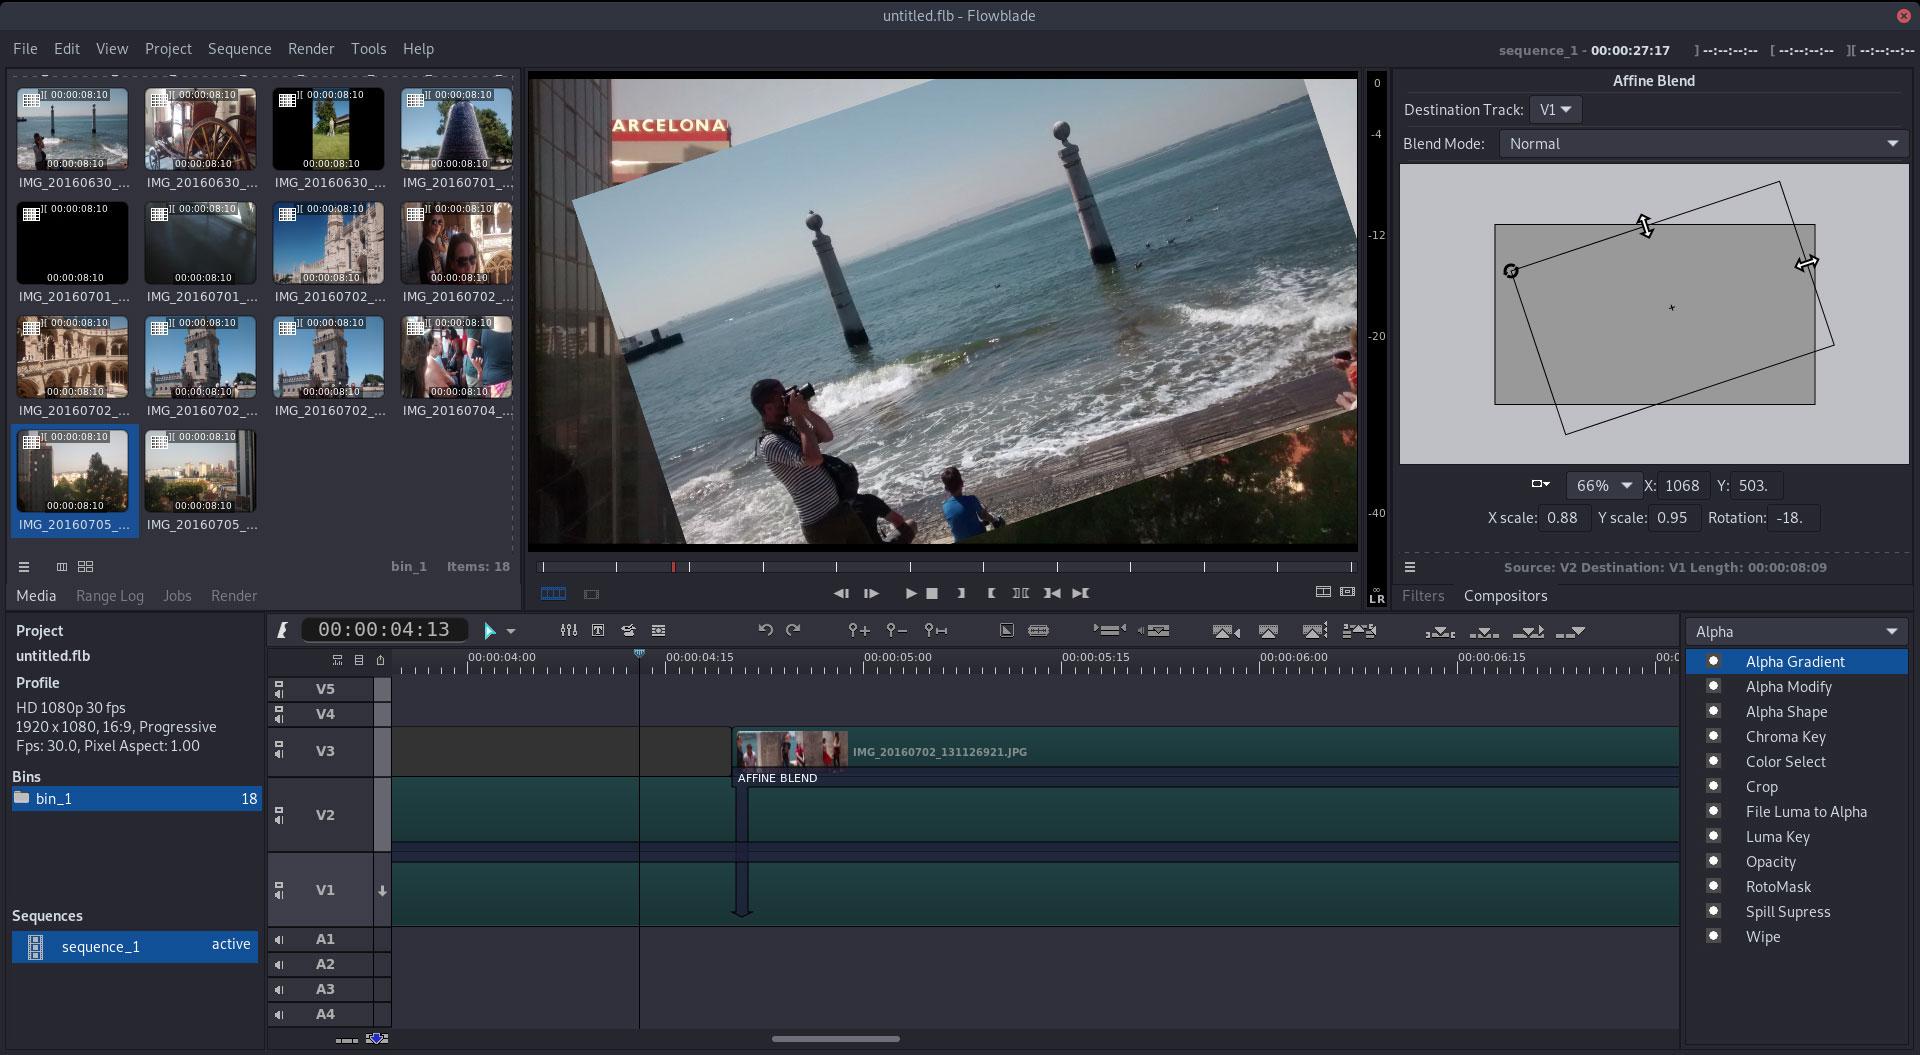 Video editing under Linux - Flowblade 2.8 is finished